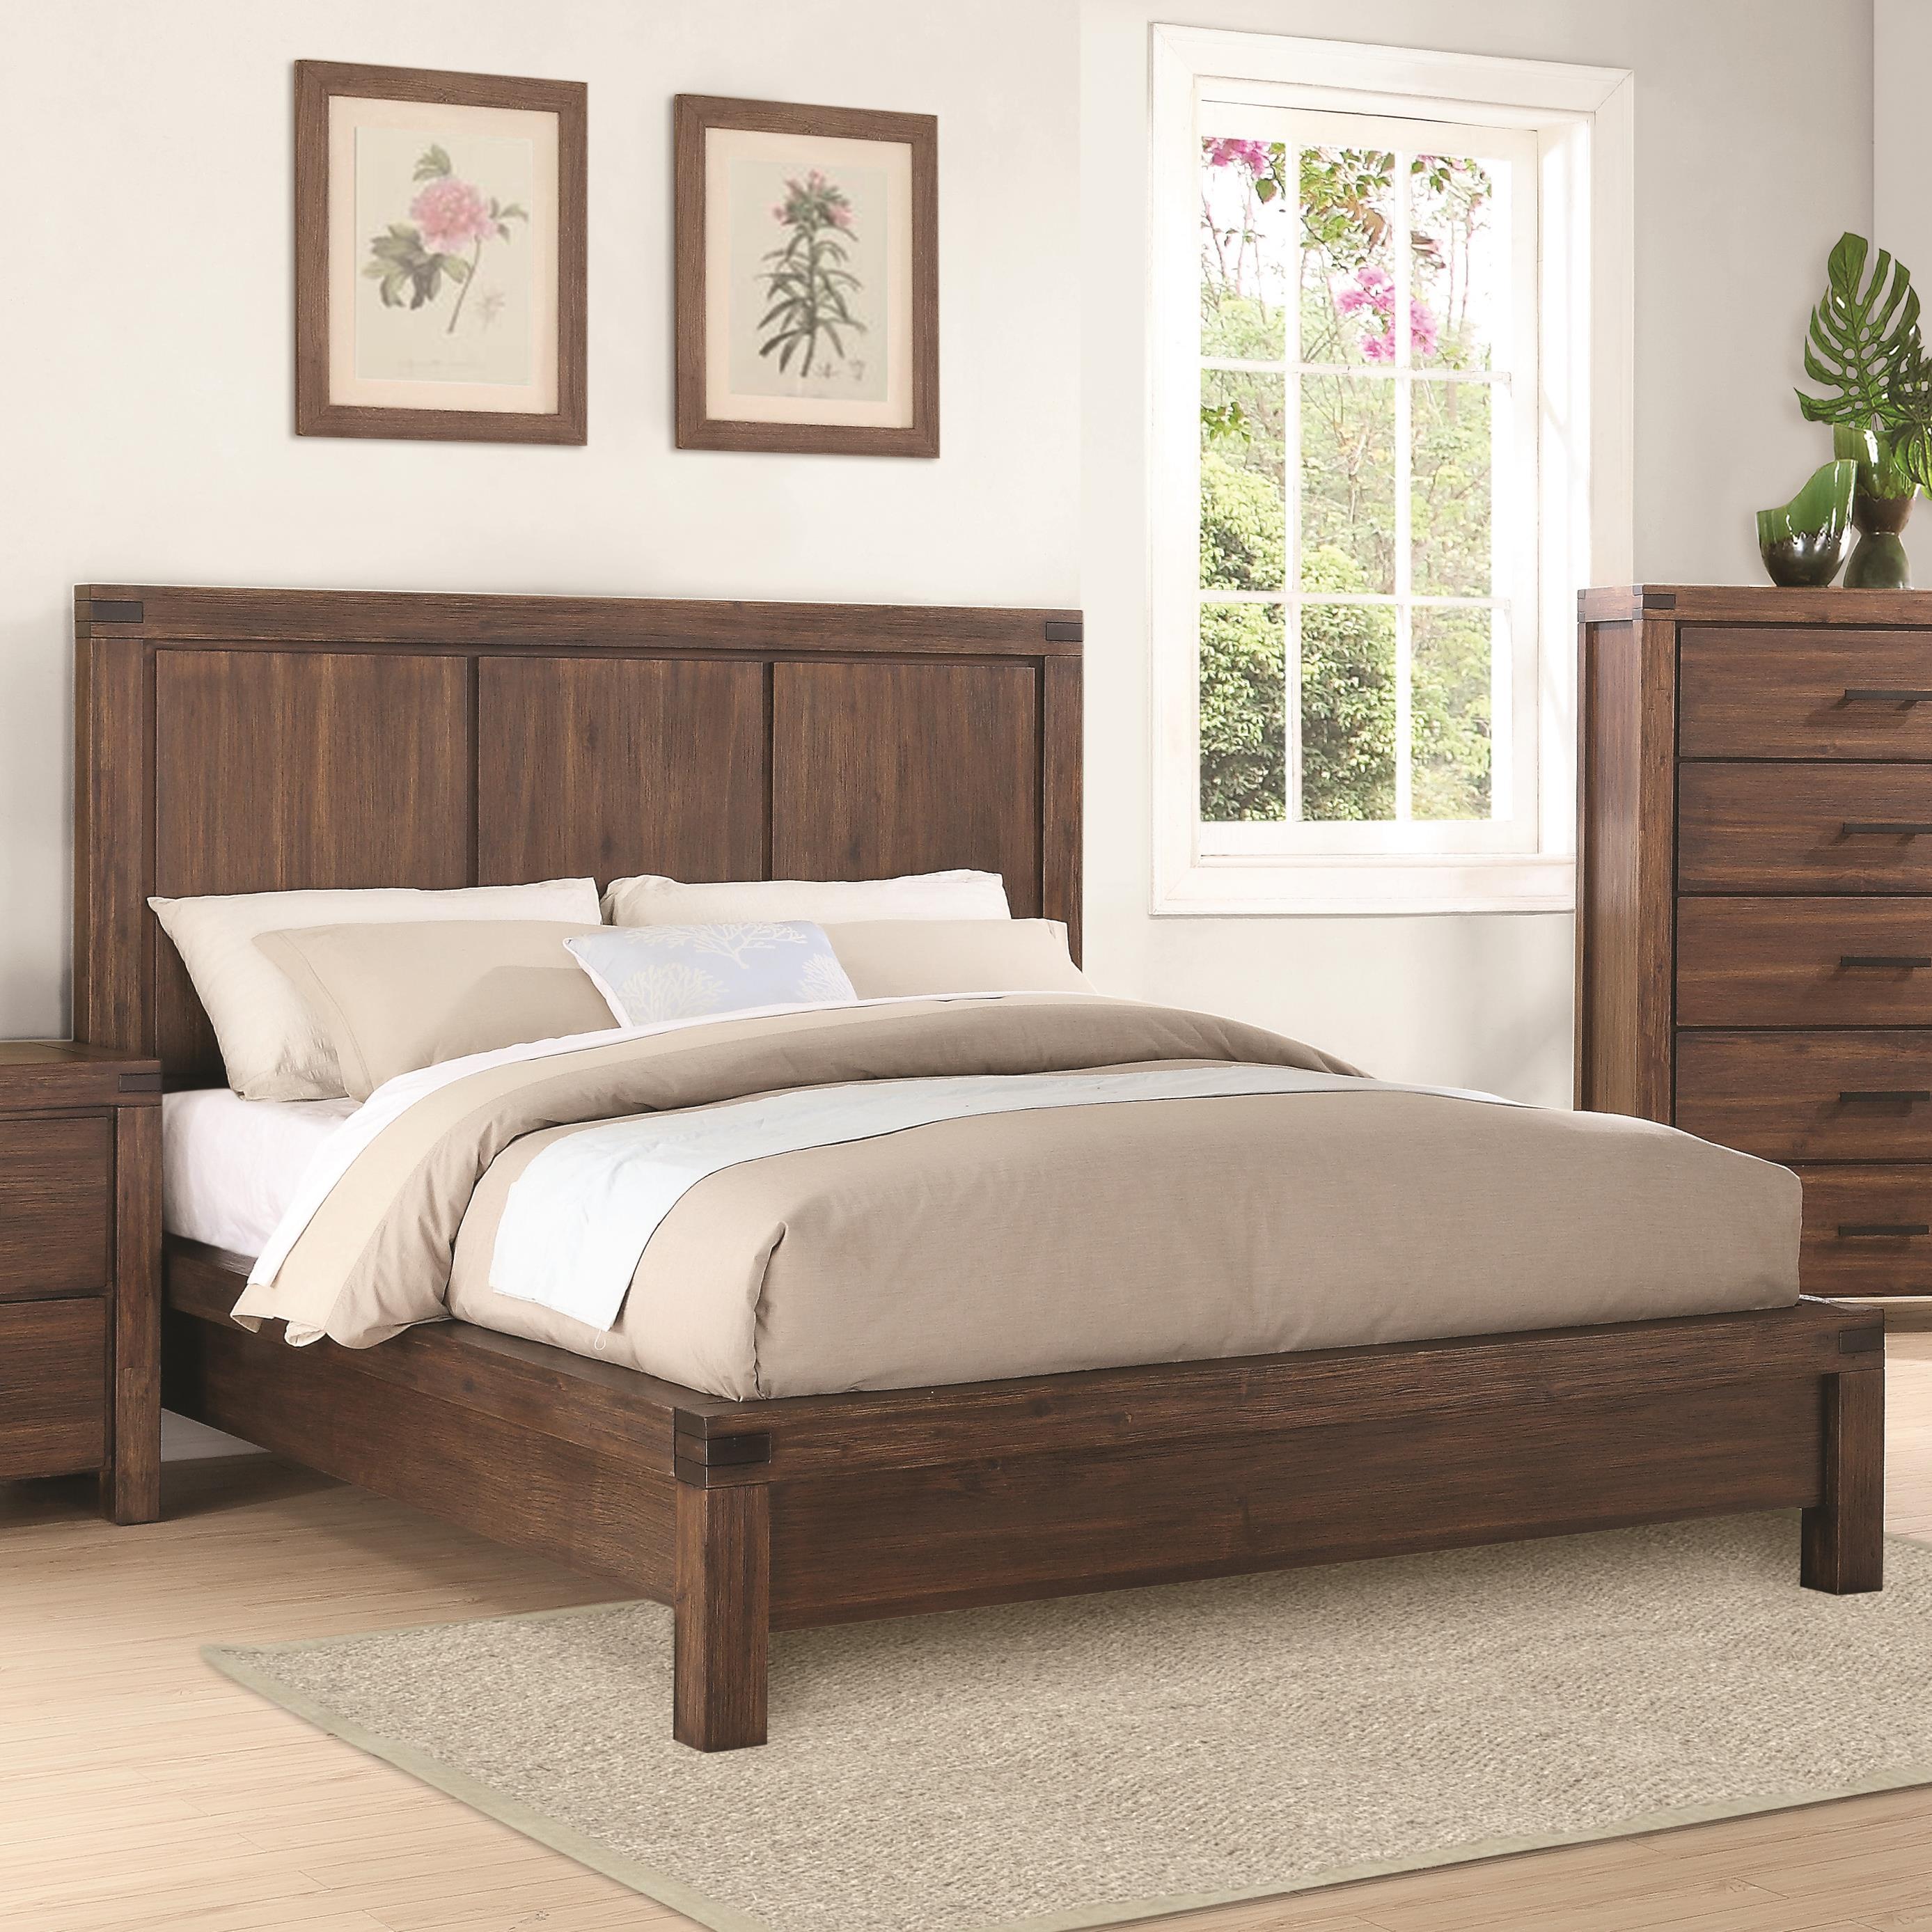 Coaster Lancashire Queen Platform Bed Value City Furniture Platform Beds Low Profile Beds